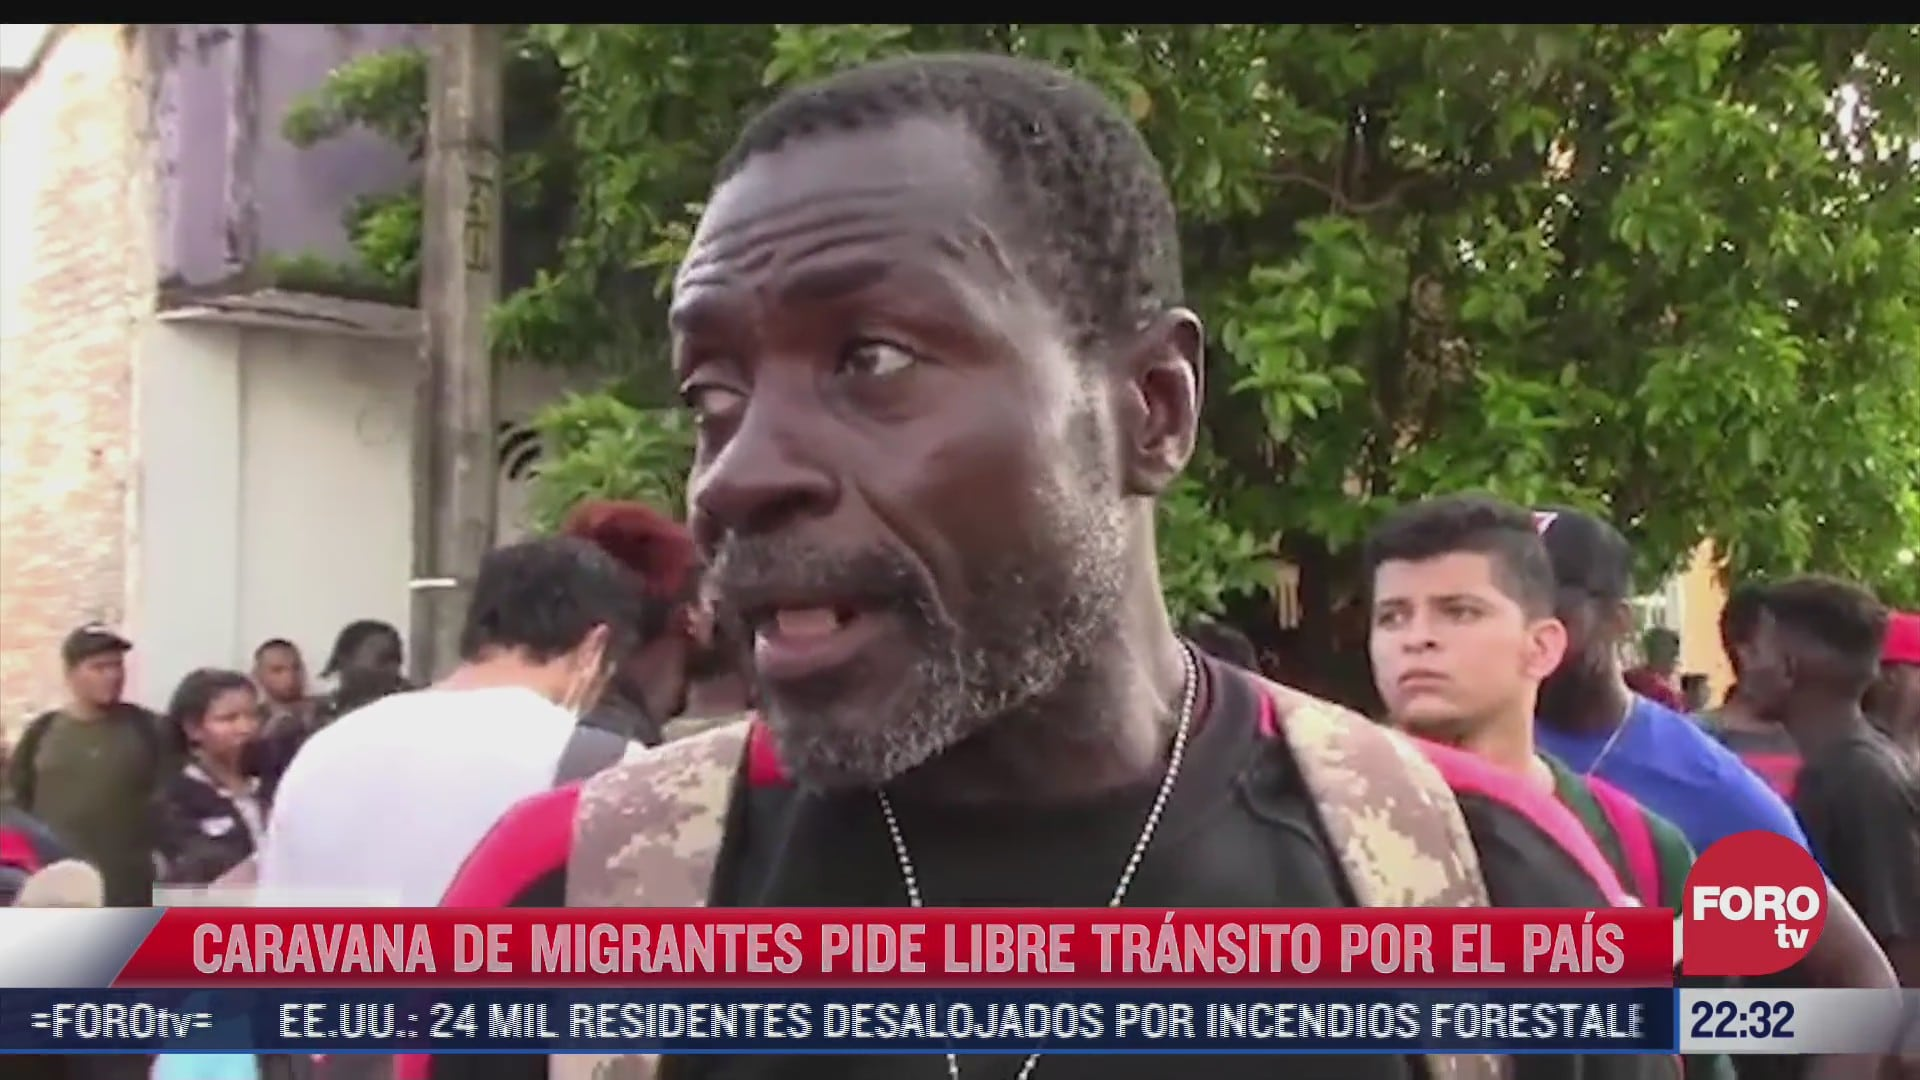 migrantes haitianos forman caravana para salir de tapachula